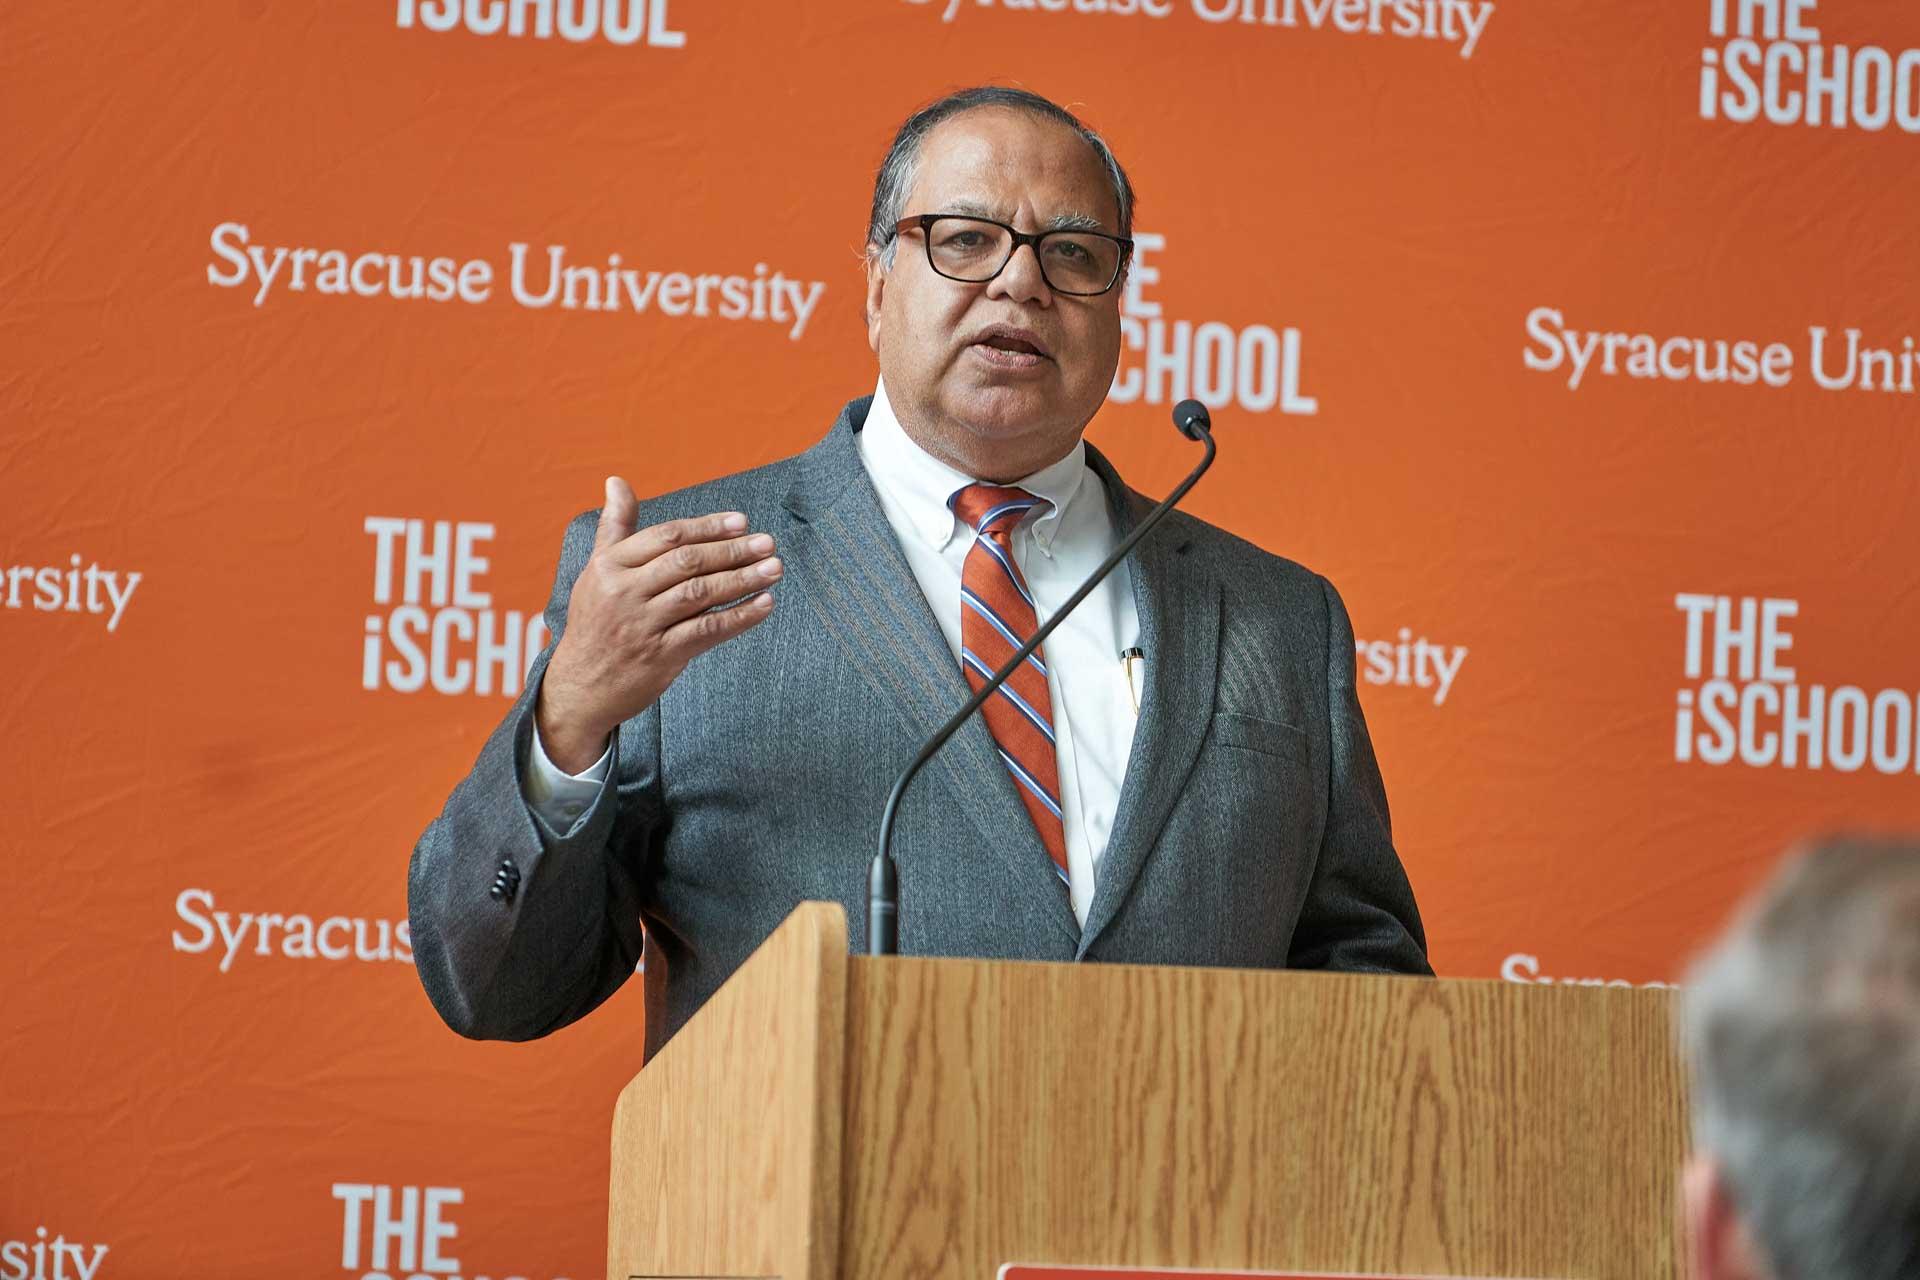 Dea Raj Dewan speaking at a podium